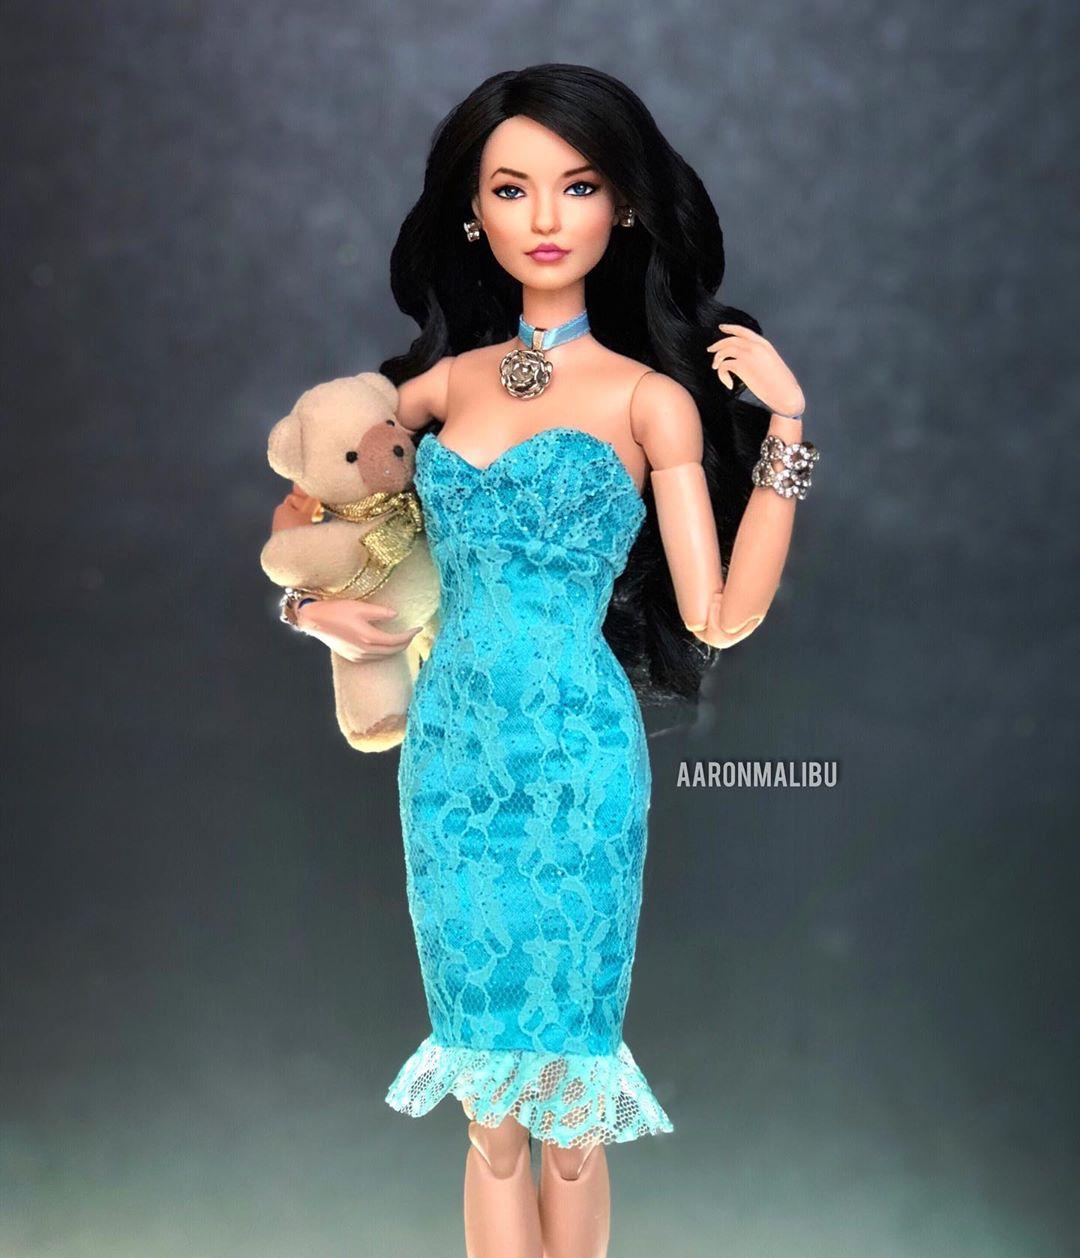 Artista transforma Barbies en personajes de telenovelas Soraya Montenegro